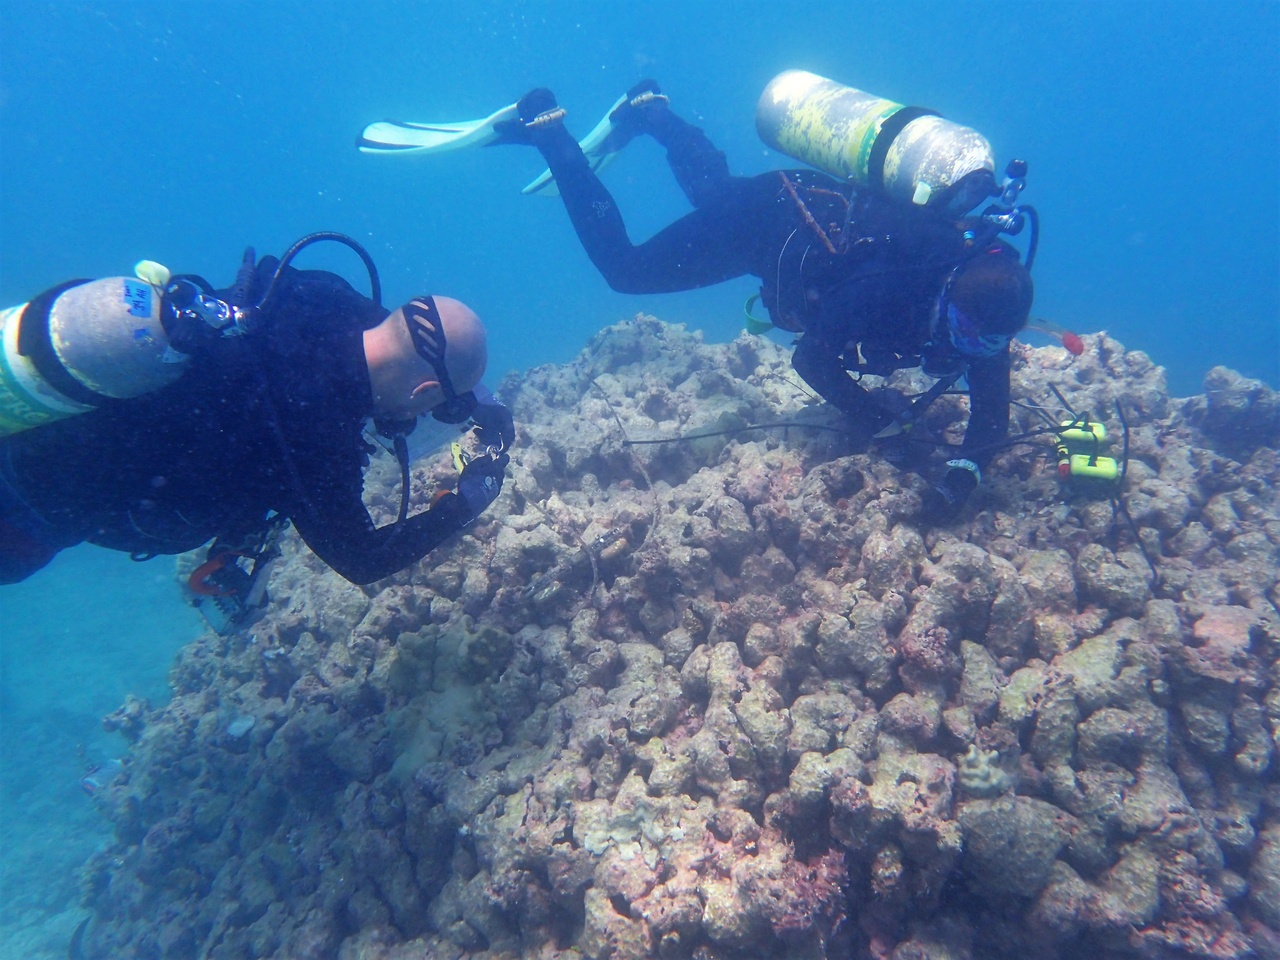 Team members Kerry Reardon and Ari Halperin retrieve and replace temperature loggers and conduct a bleaching survey at Lisianski. <i>photo: NOAA Fisheries/Jennifer Samson. </i>